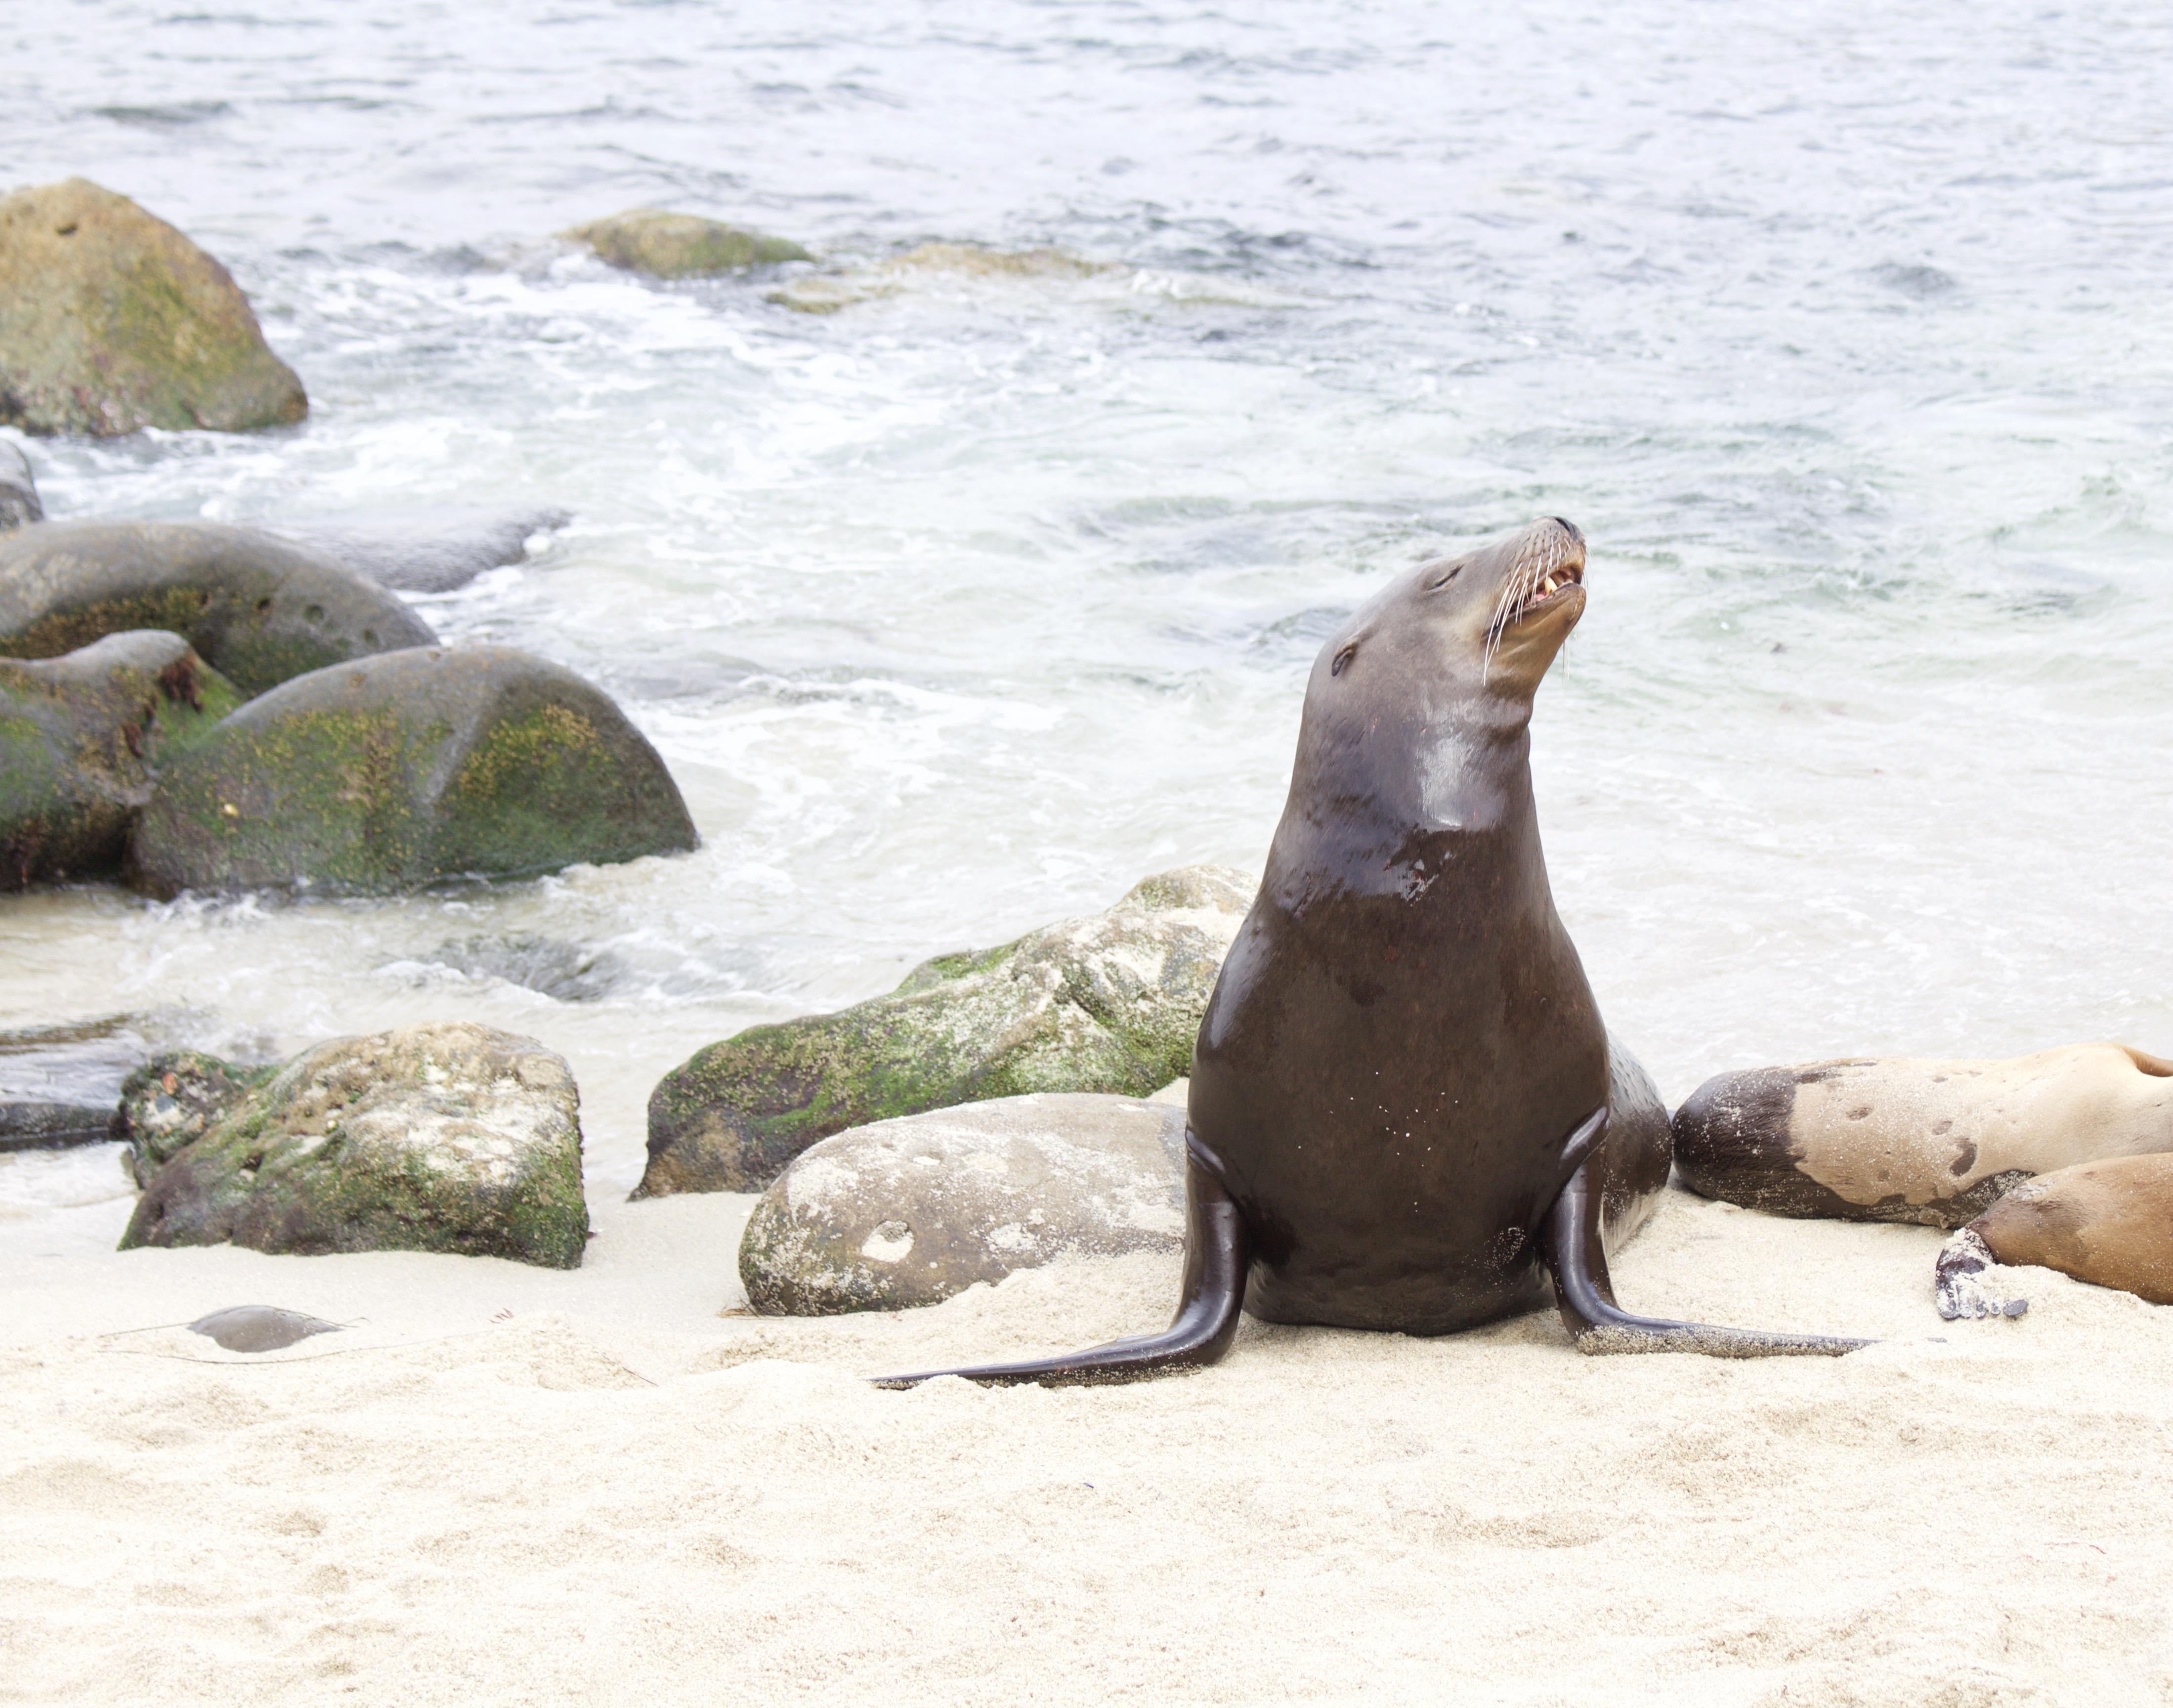 seal - la jolla cove - My Styled Life